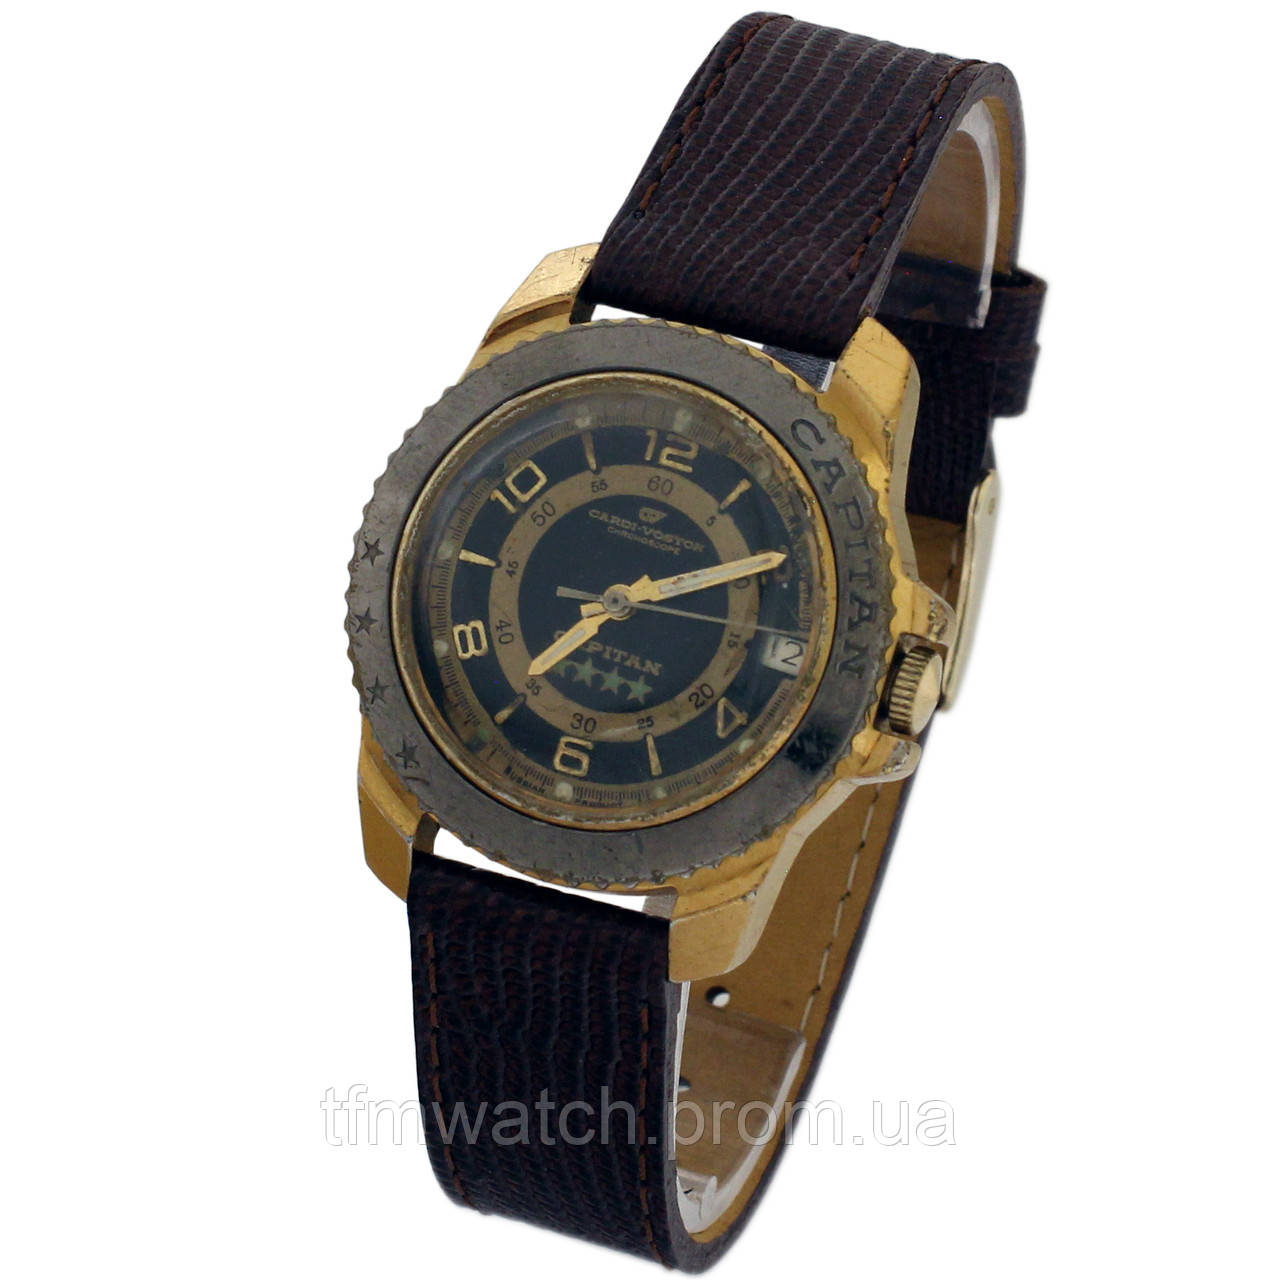 Мужские наручные часы Cardi